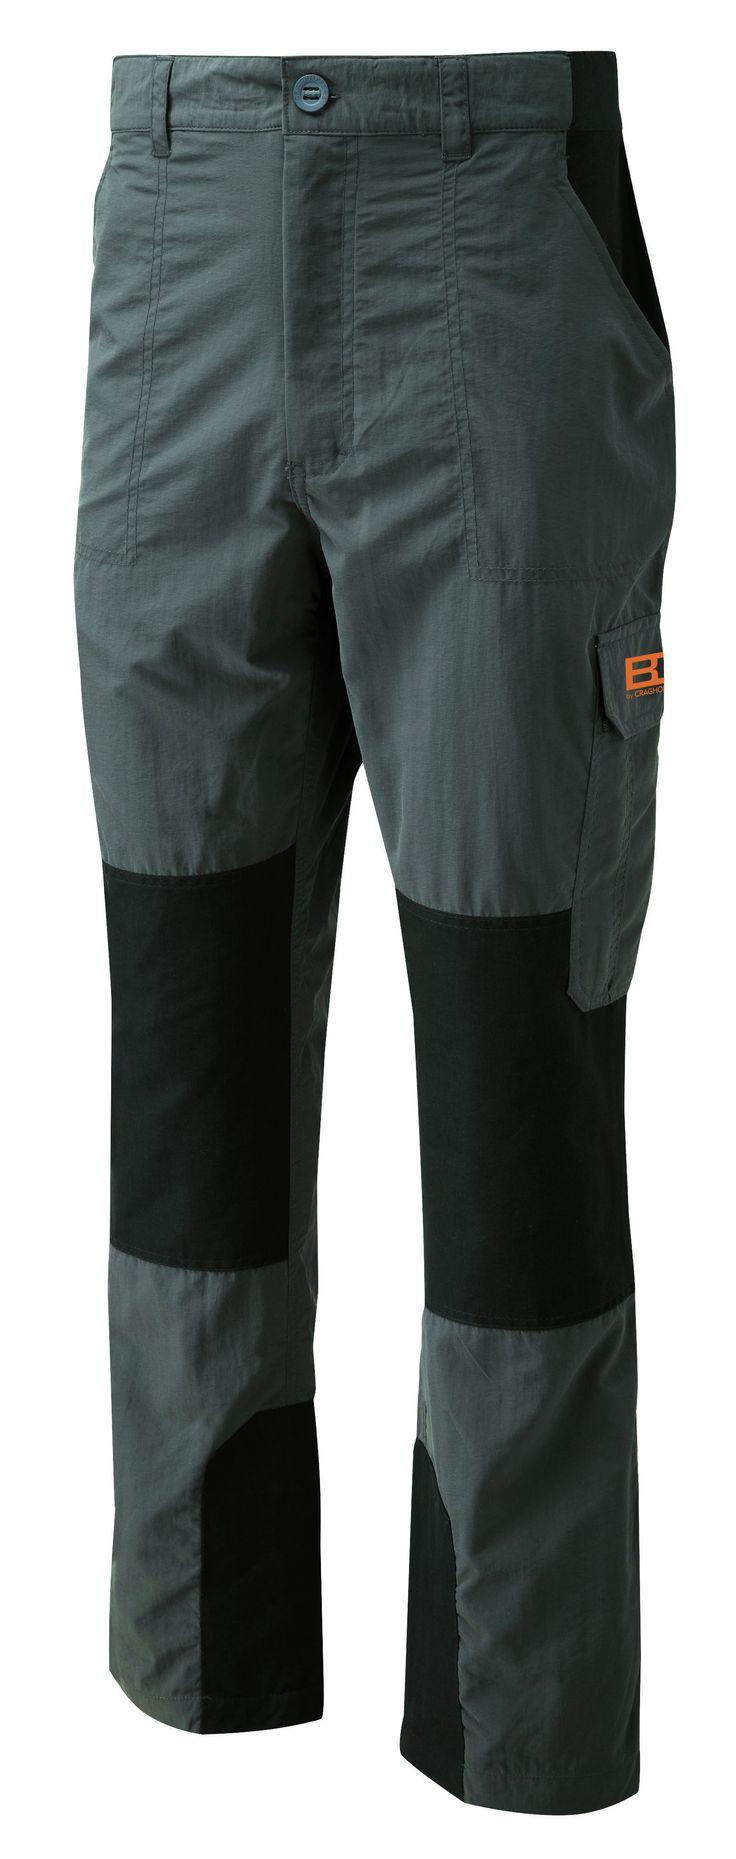 Craghoppers Bear Survivor Trousers | Bear Grylls Clothing | Craghoppers Bear Grylls